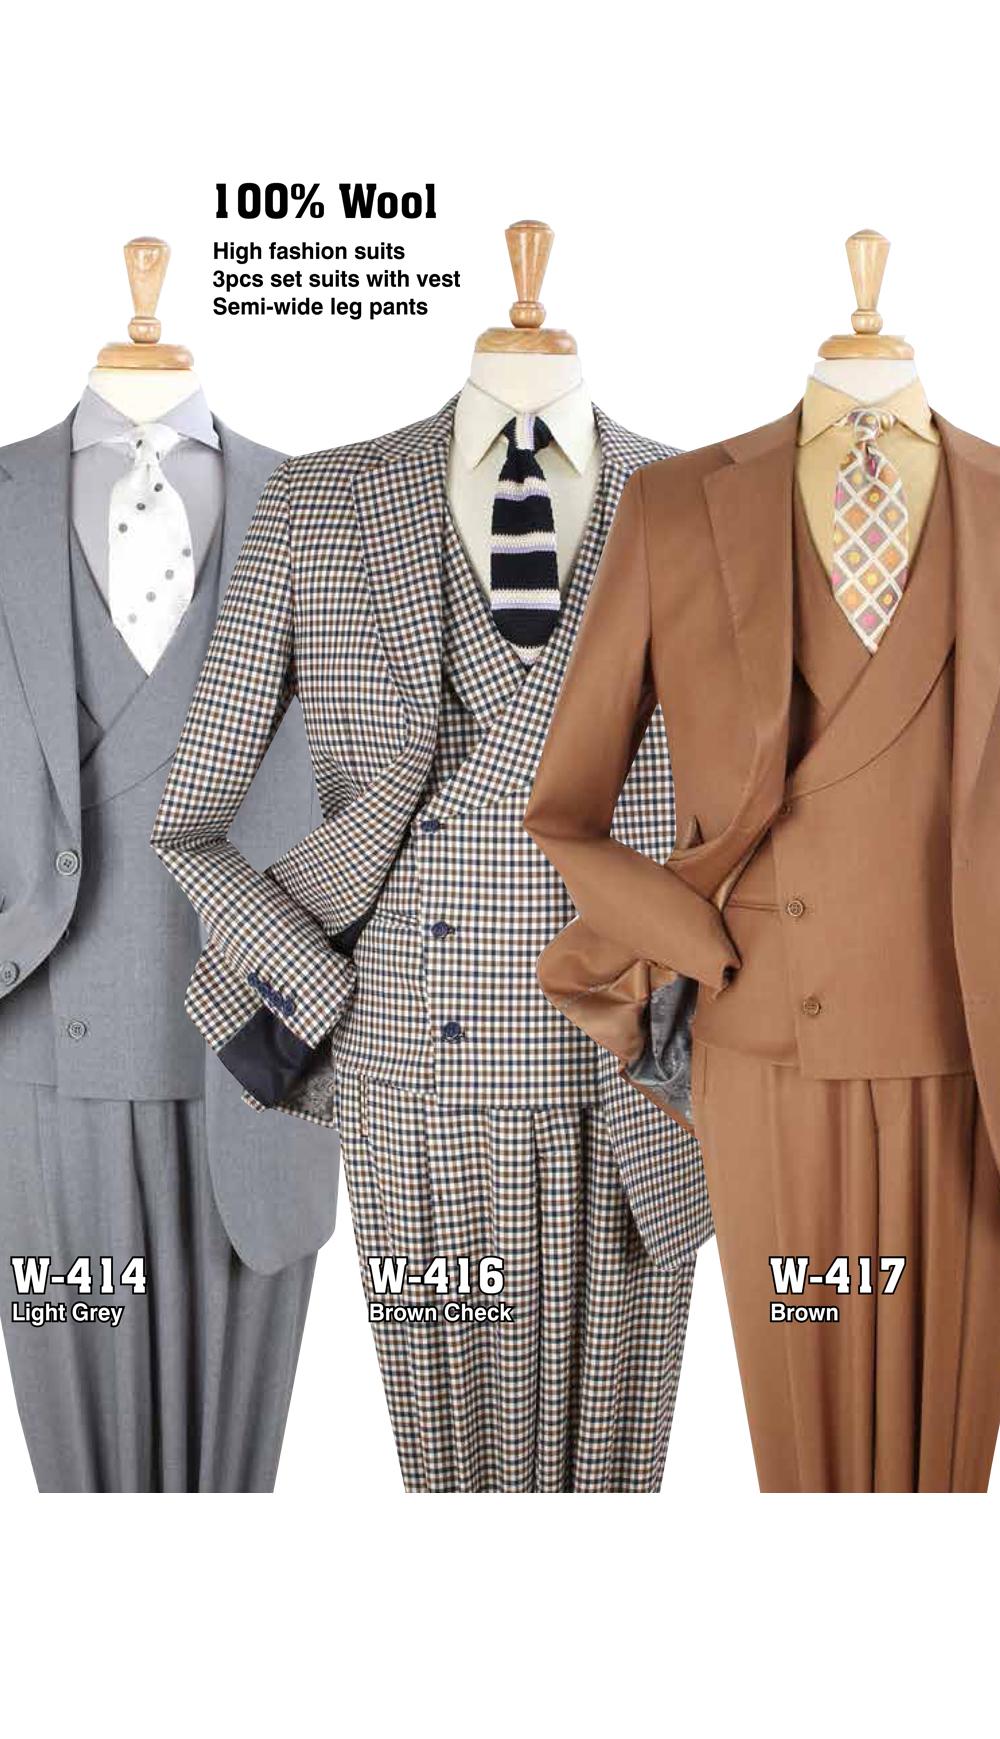 High Fashion Men Suits W-414